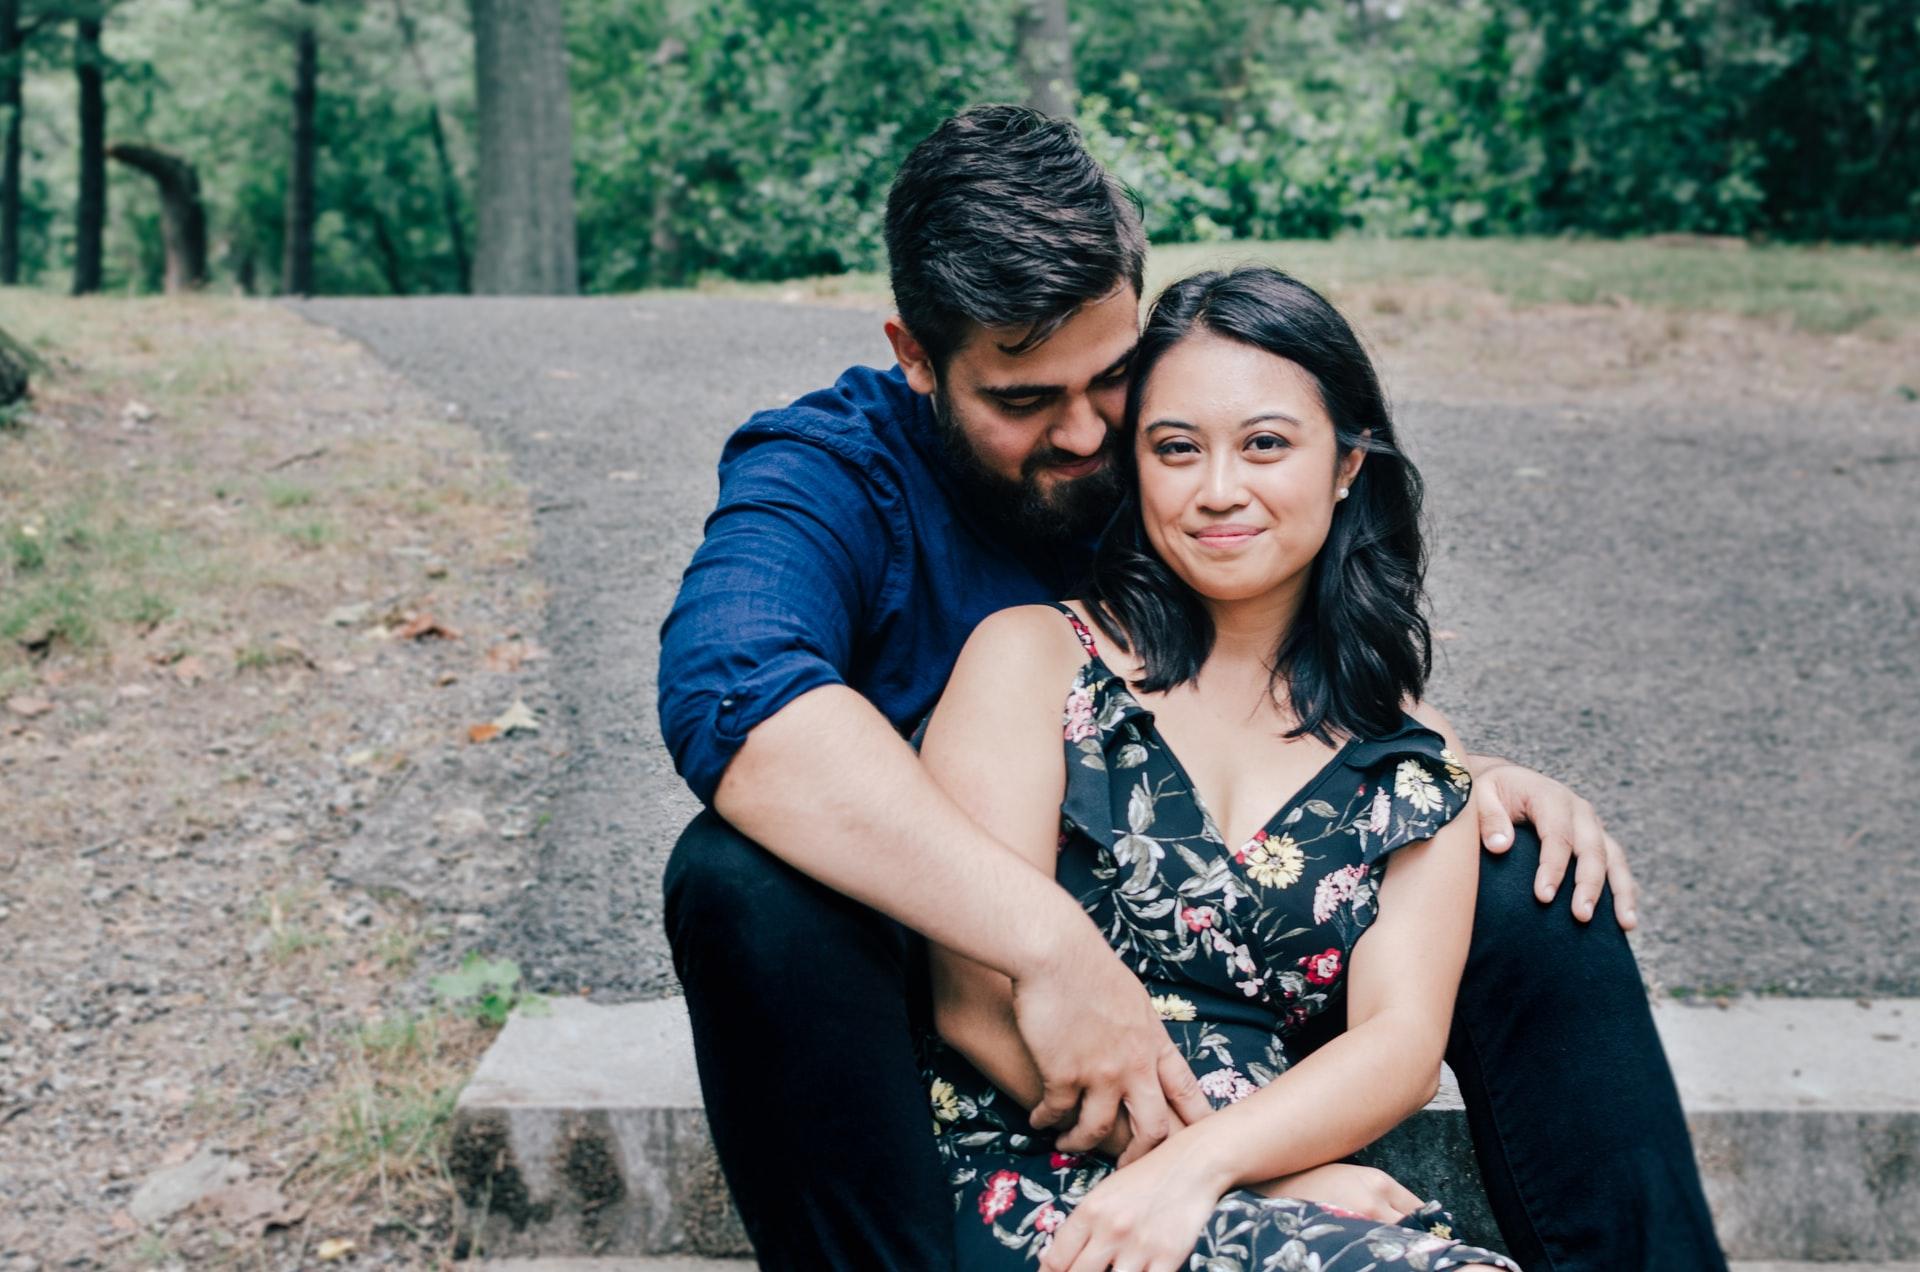 When Boundaries in Marriage Work